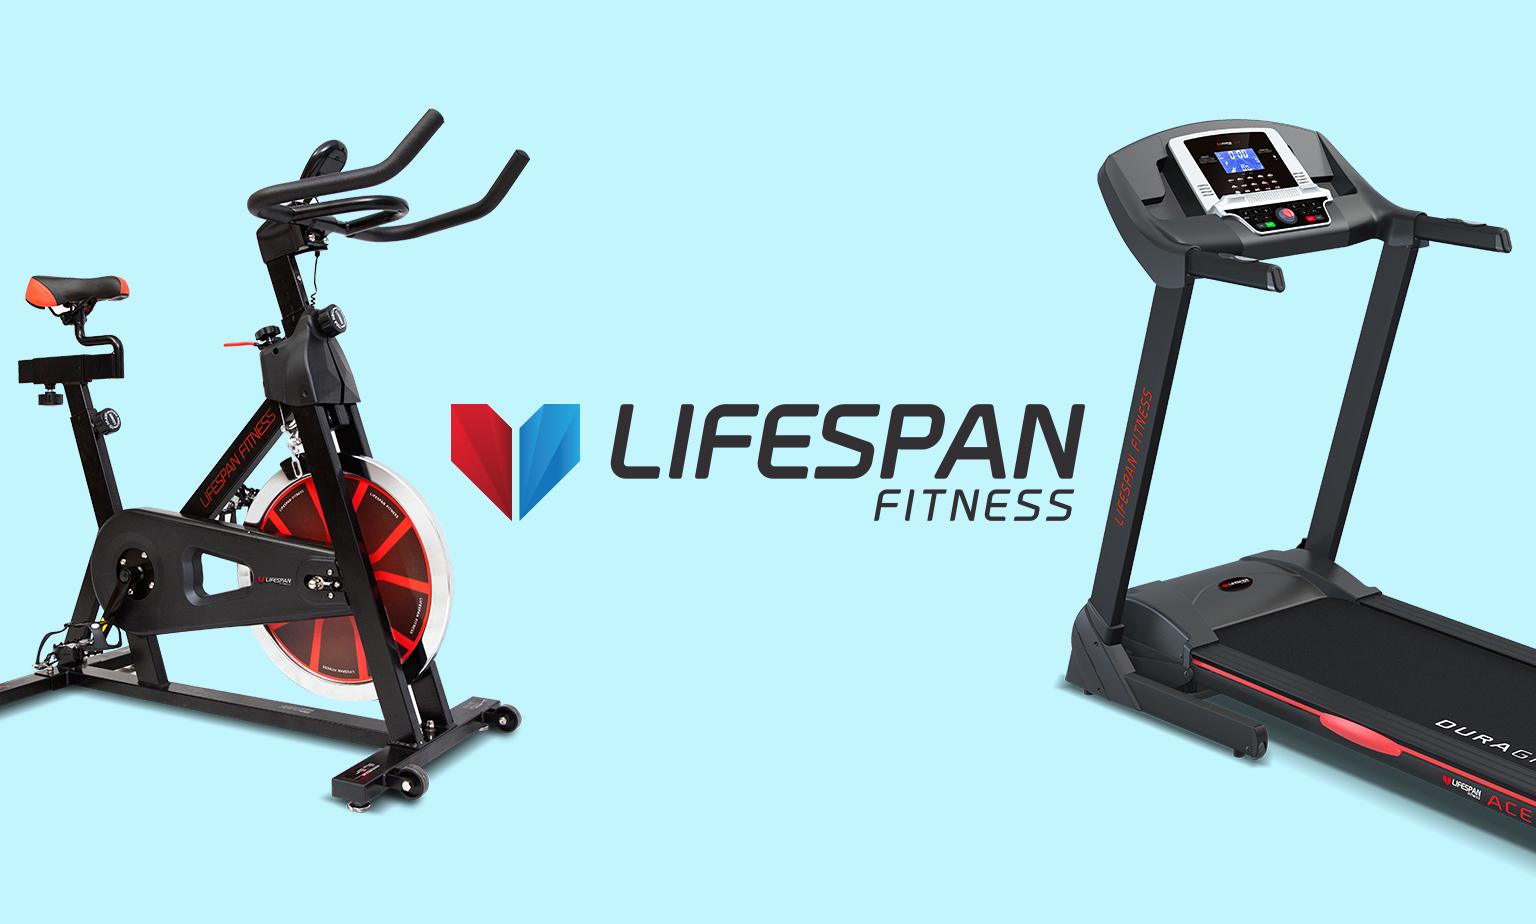 20% Off Gym & Cardio Equipment